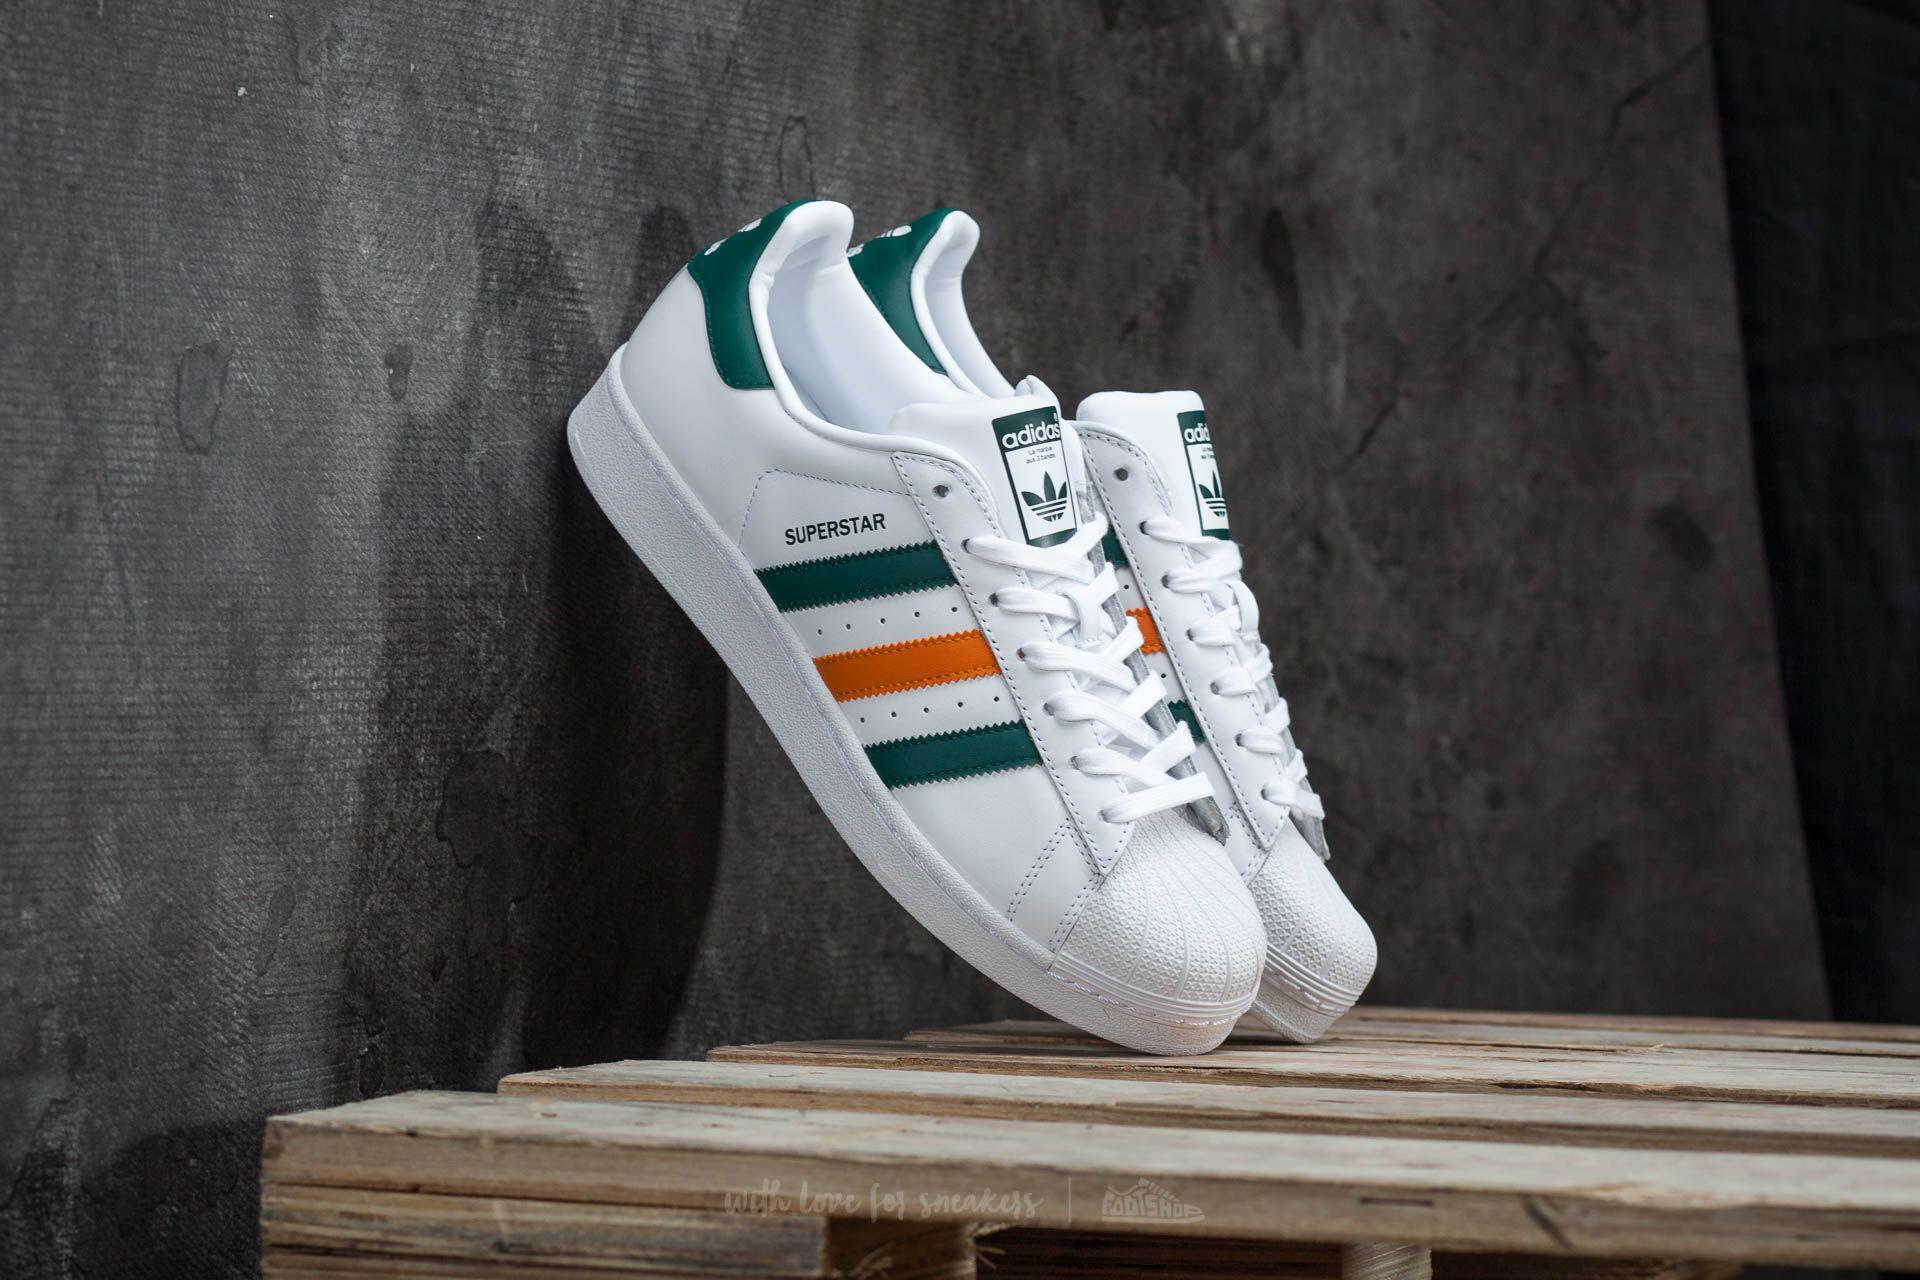 Lyst - adidas Originals Adidas Superstar Ftw White  Collegiate Green ... 85488f374b2f0